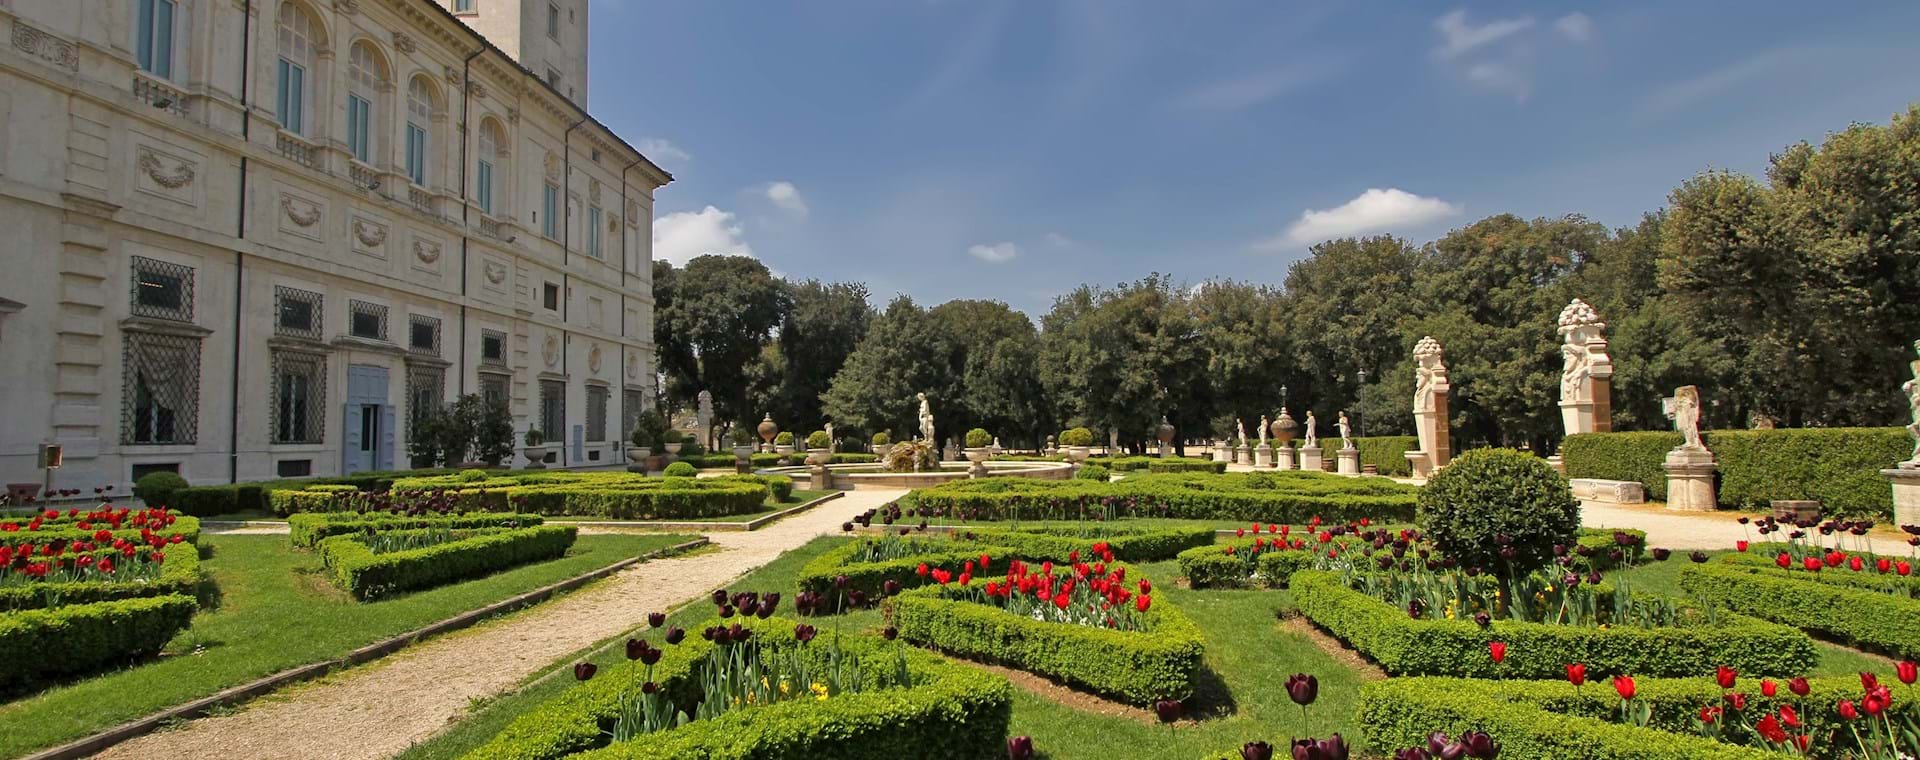 Private Borghese Gallery & Gardens Tour